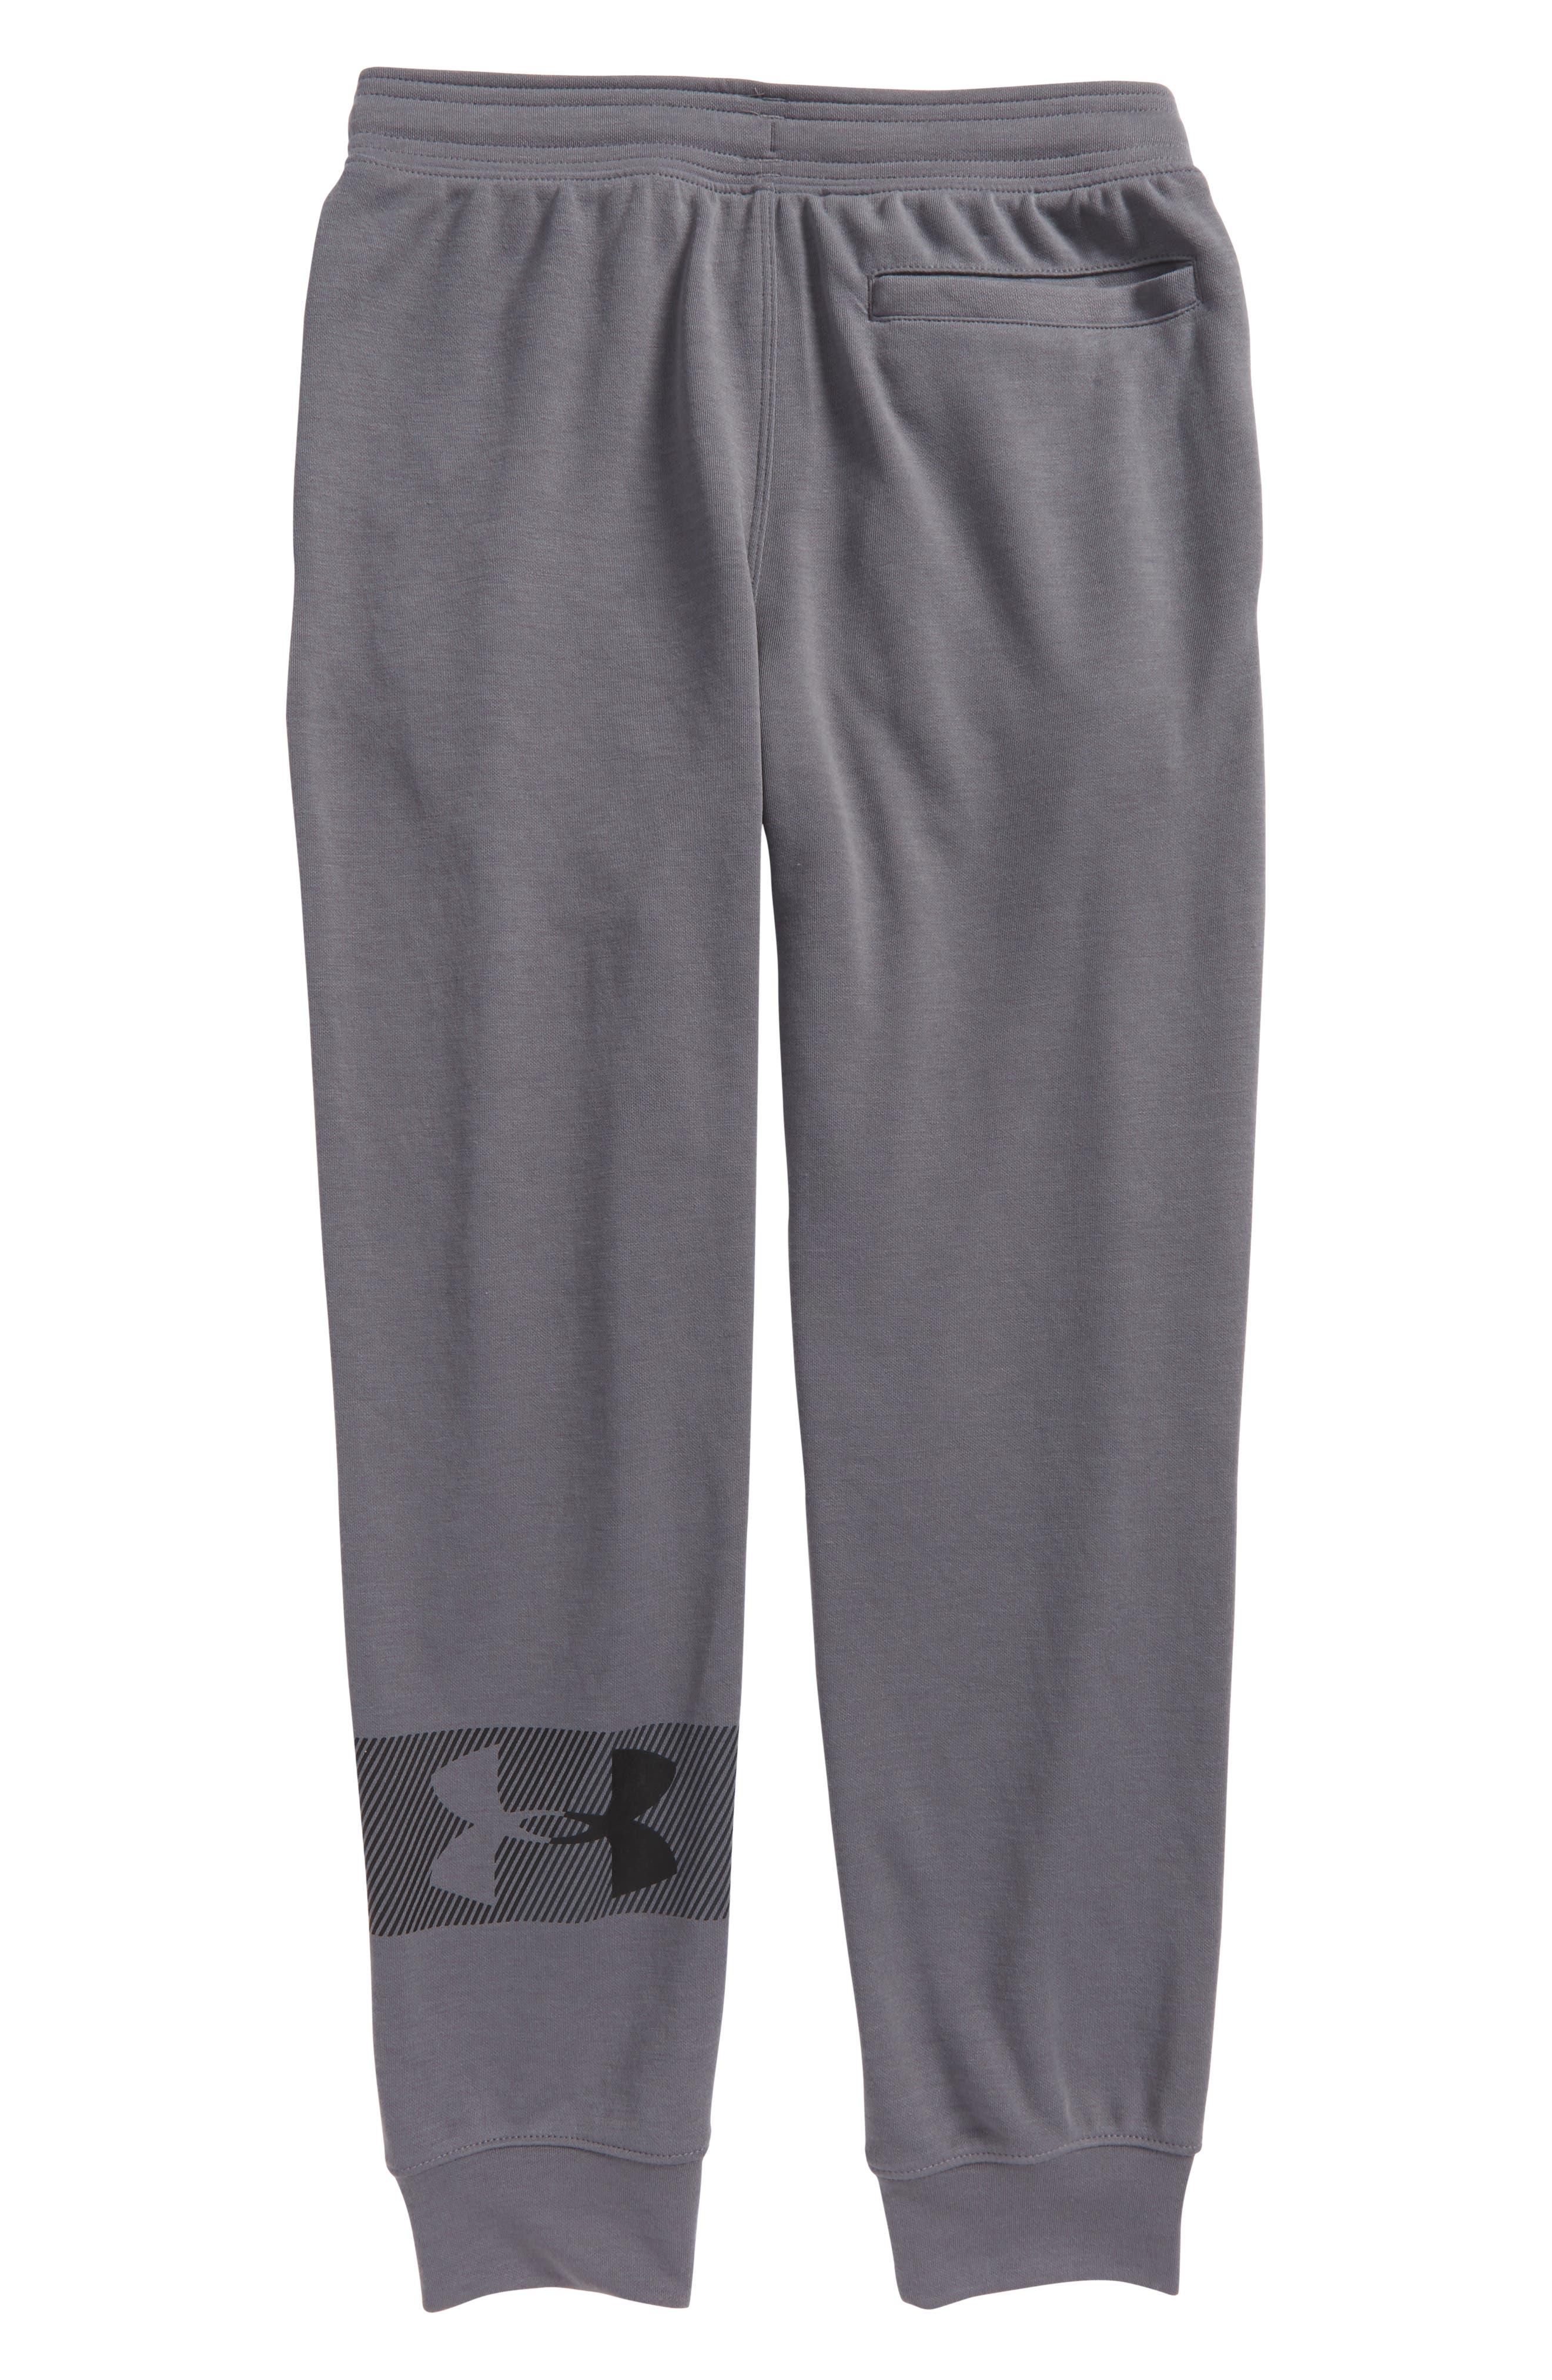 Threadborne Tech Sweatpants,                             Alternate thumbnail 2, color,                             Graphite/ Black